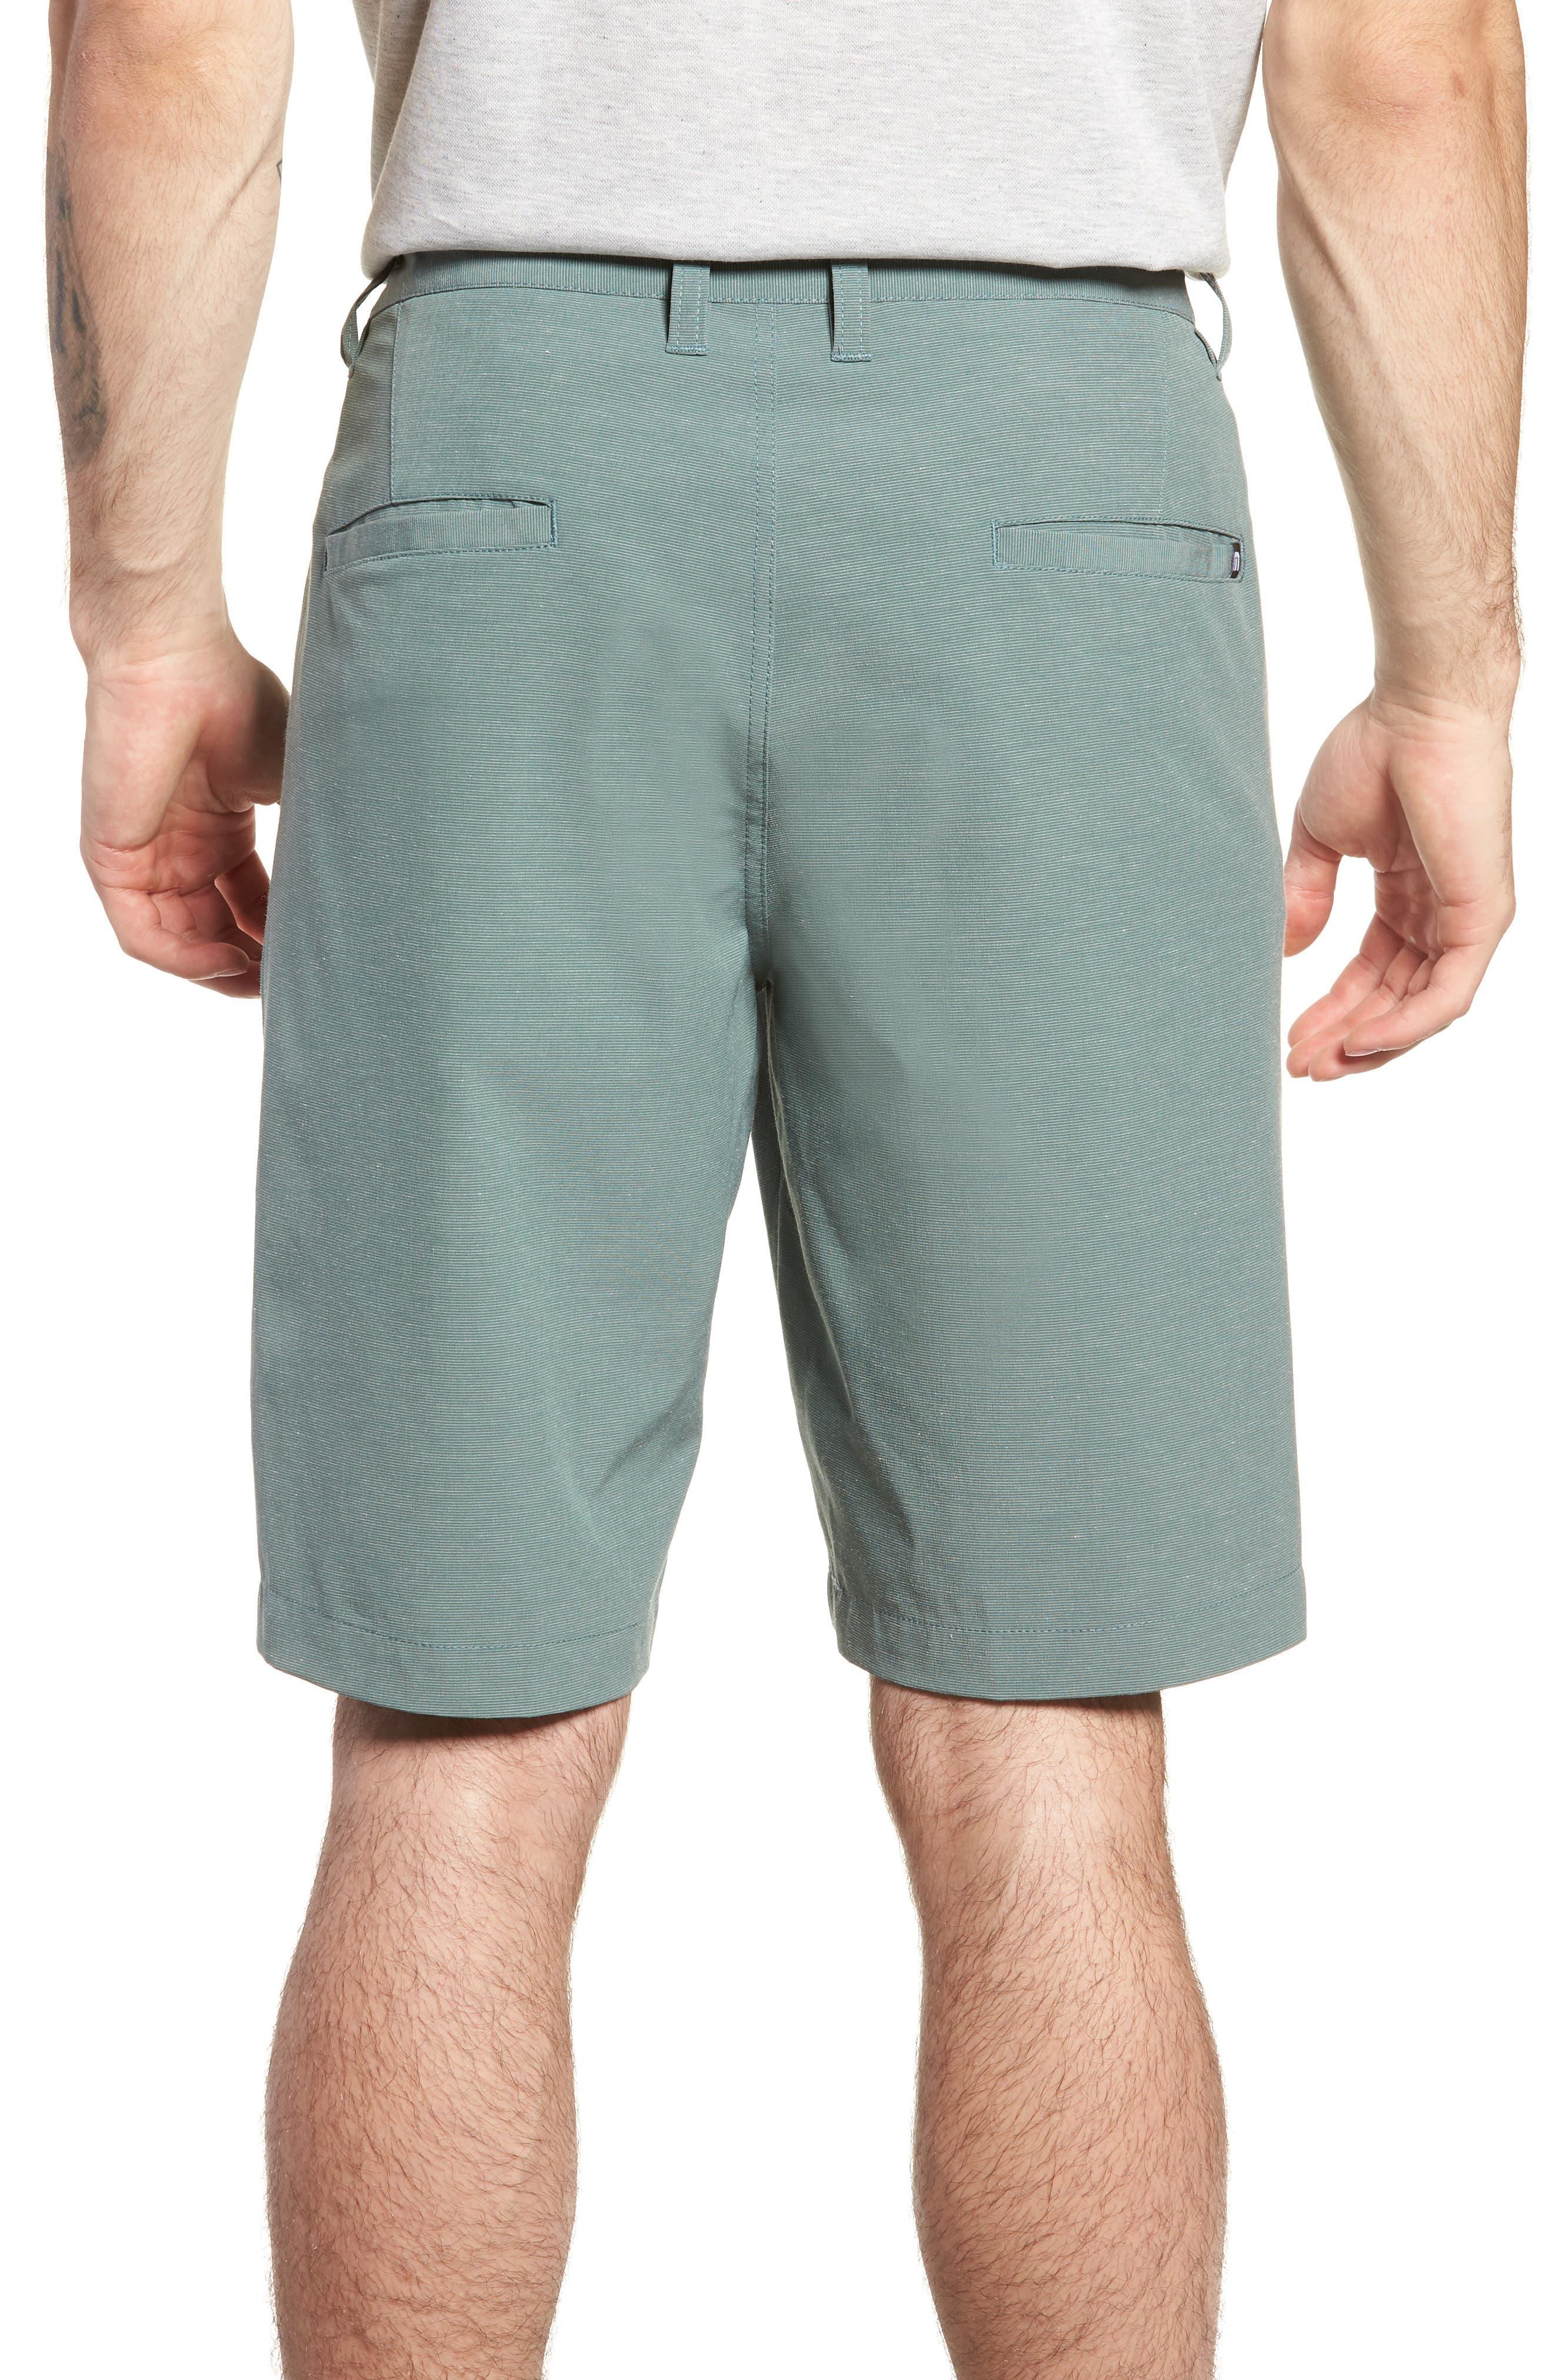 Revival Shorts,                             Alternate thumbnail 2, color,                             BALSAM GREEN